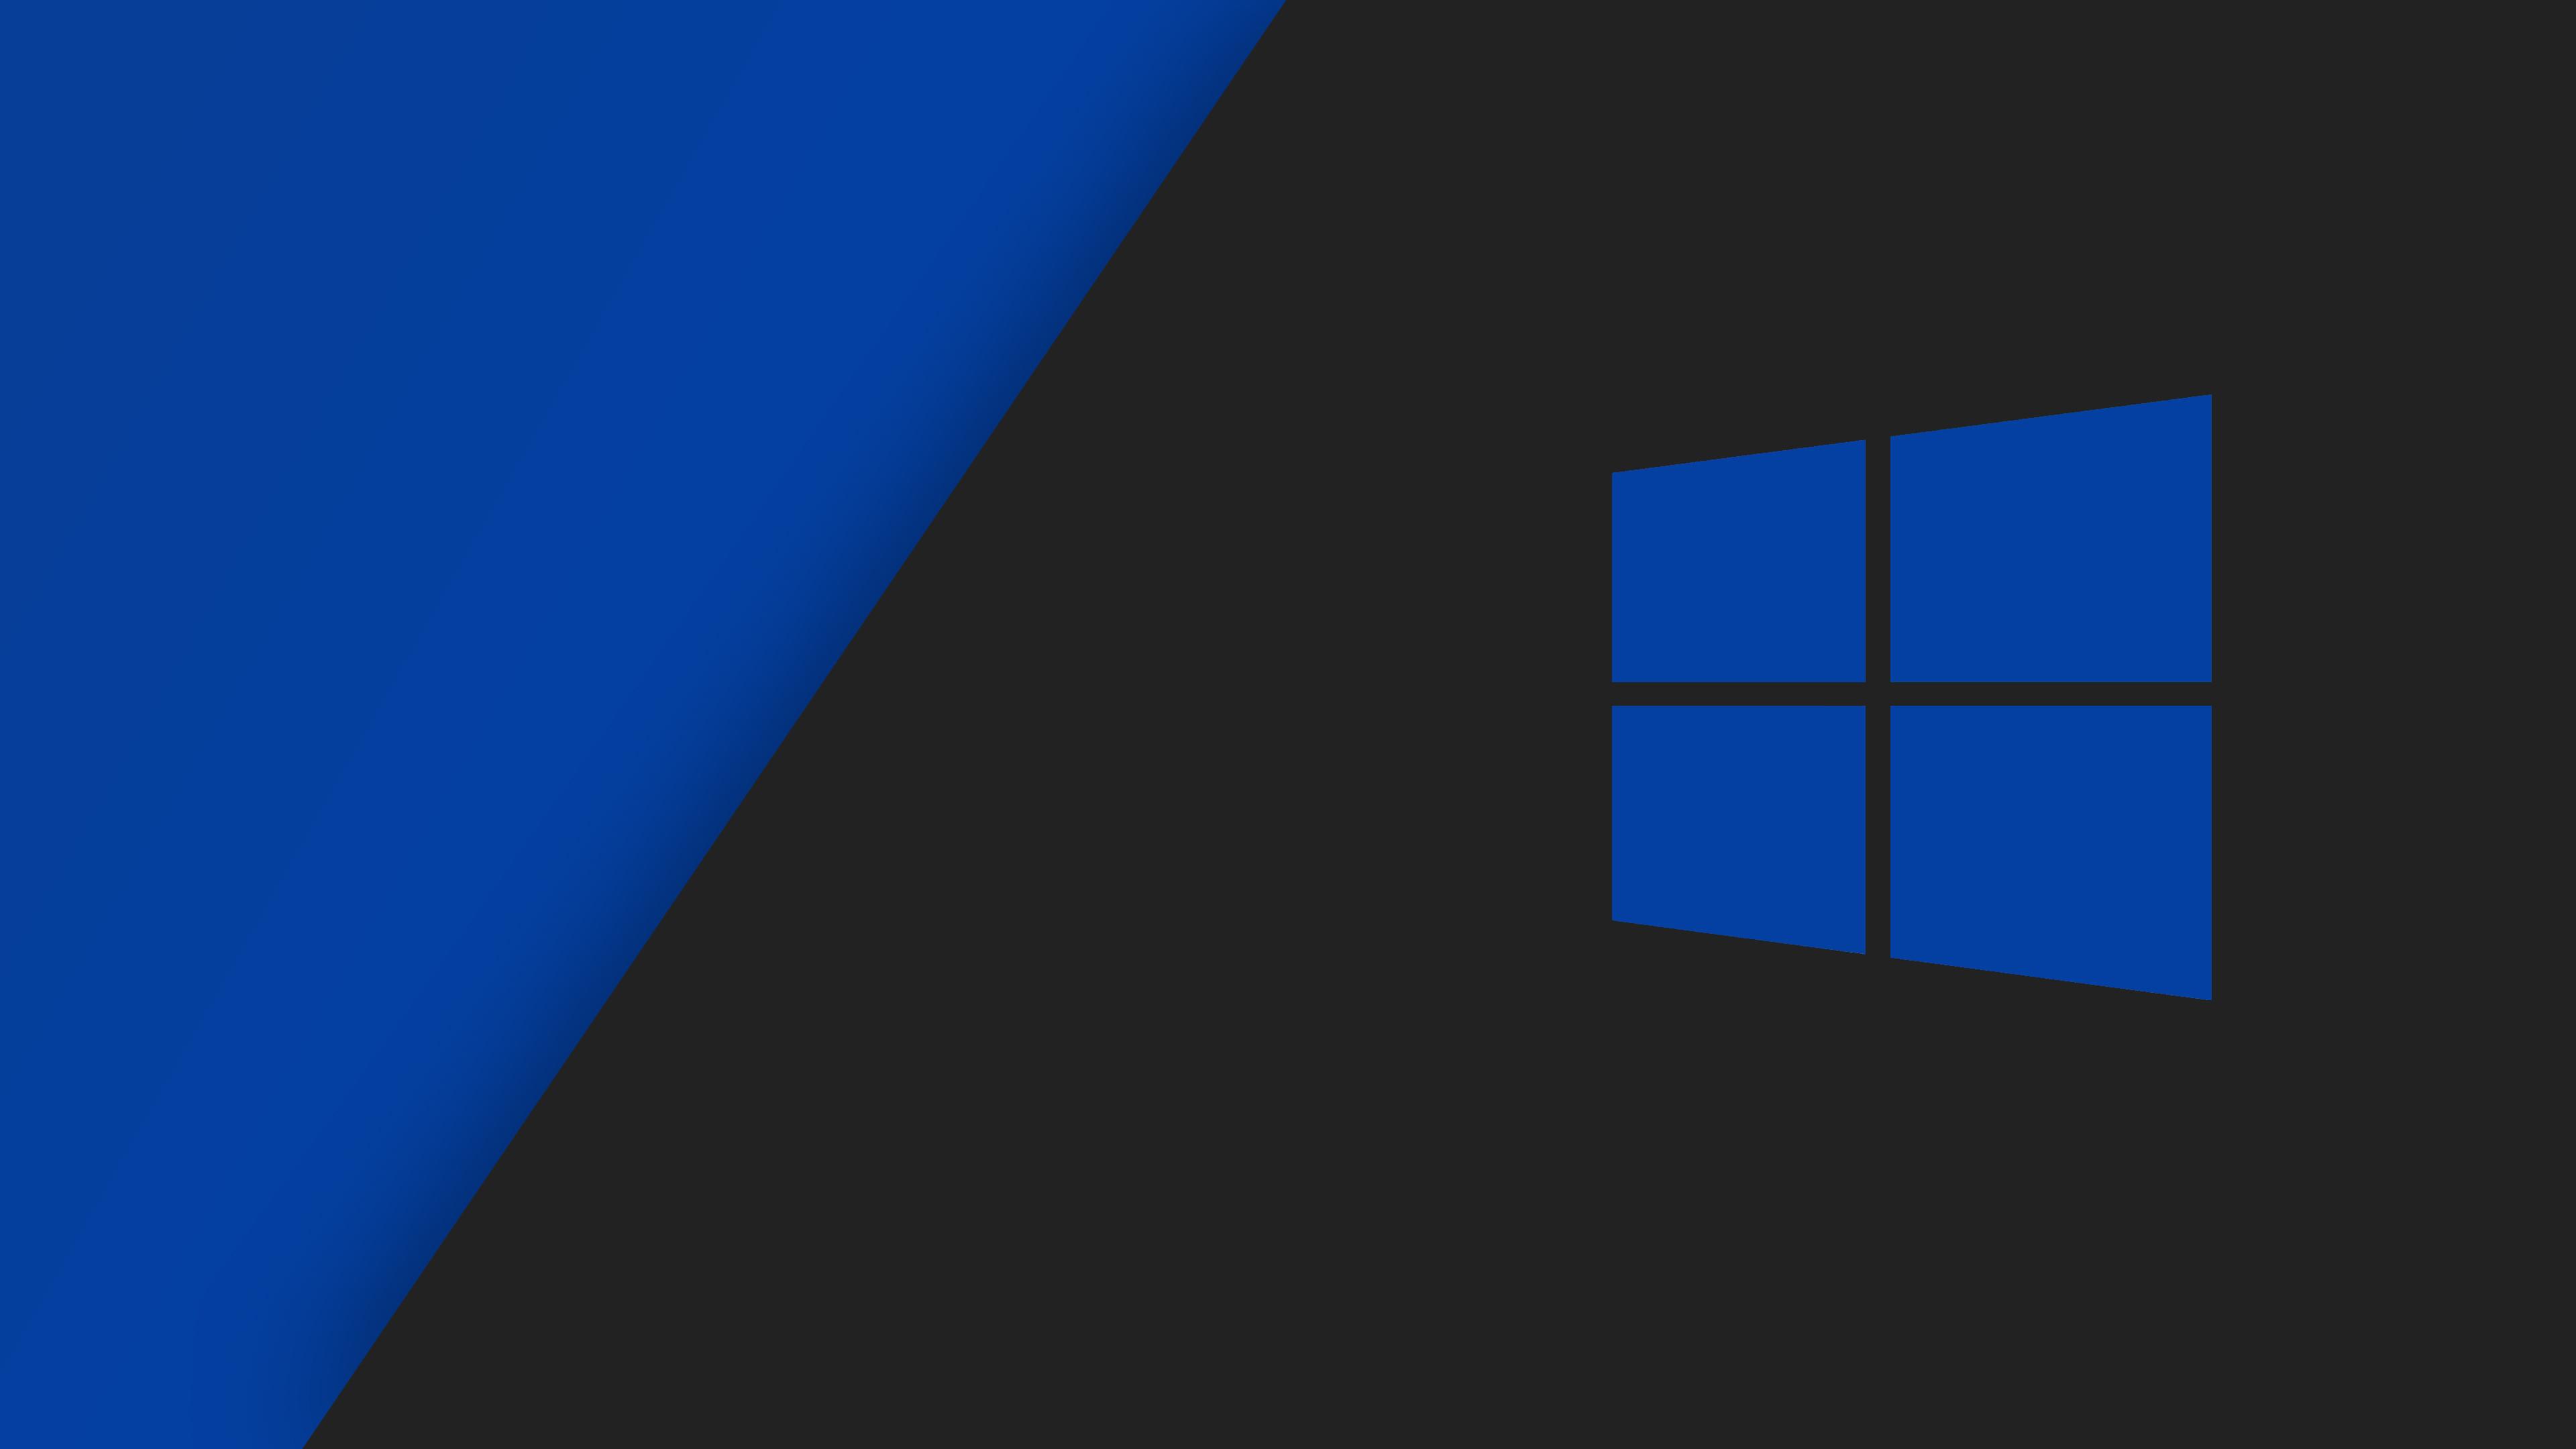 Window 10 Wallpaper 1080p